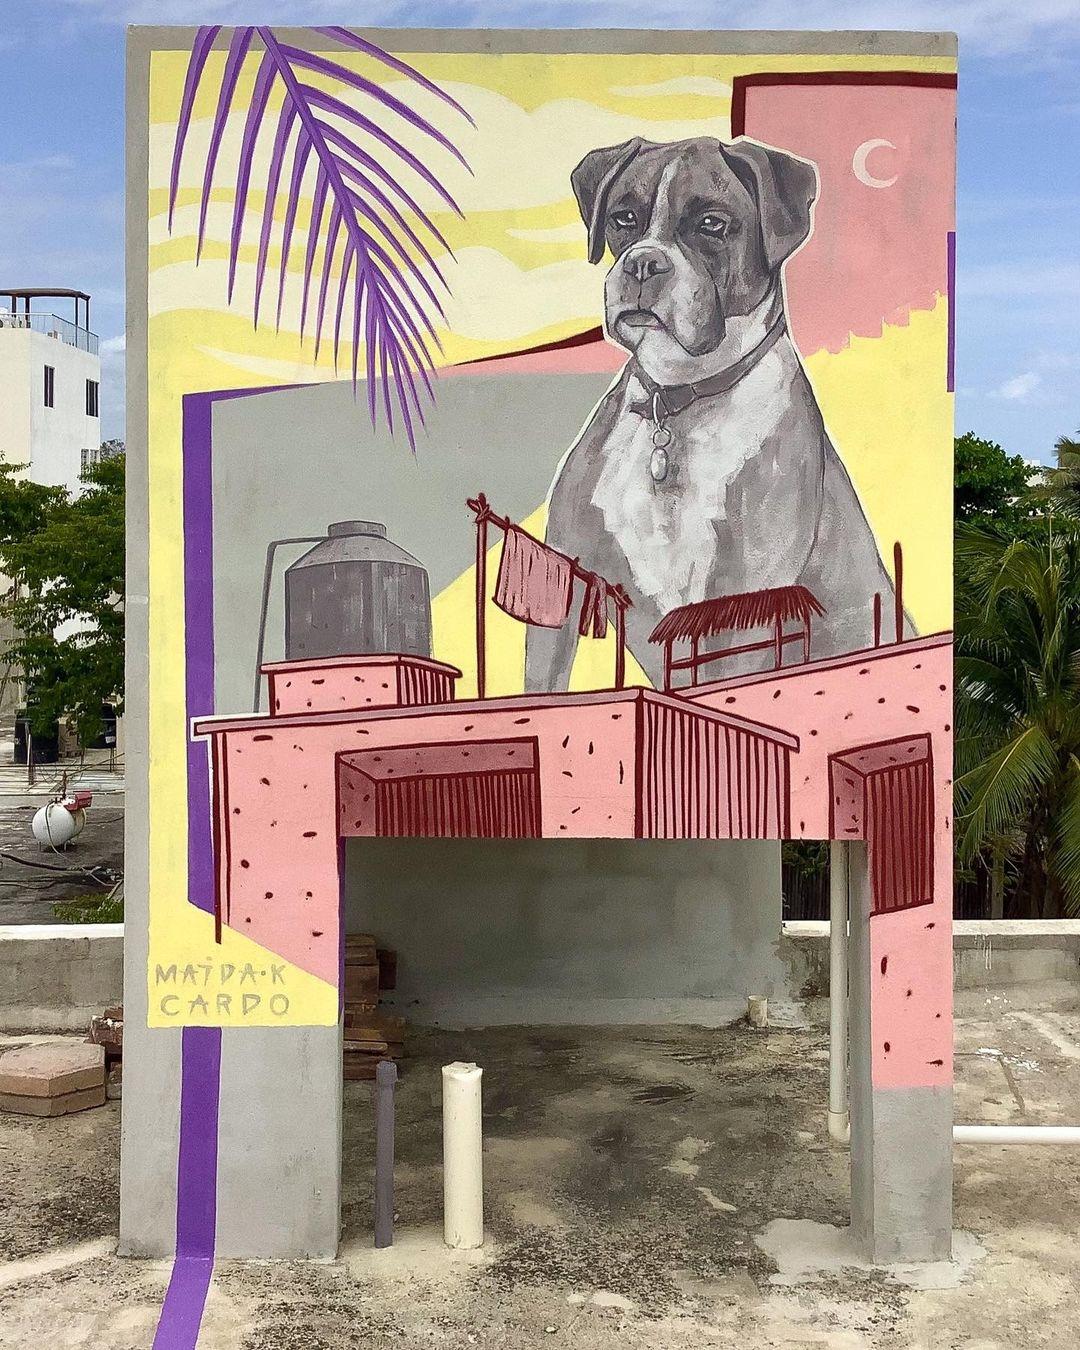 CARDO + MAIDA K @ Playa del Carmen, Mexico